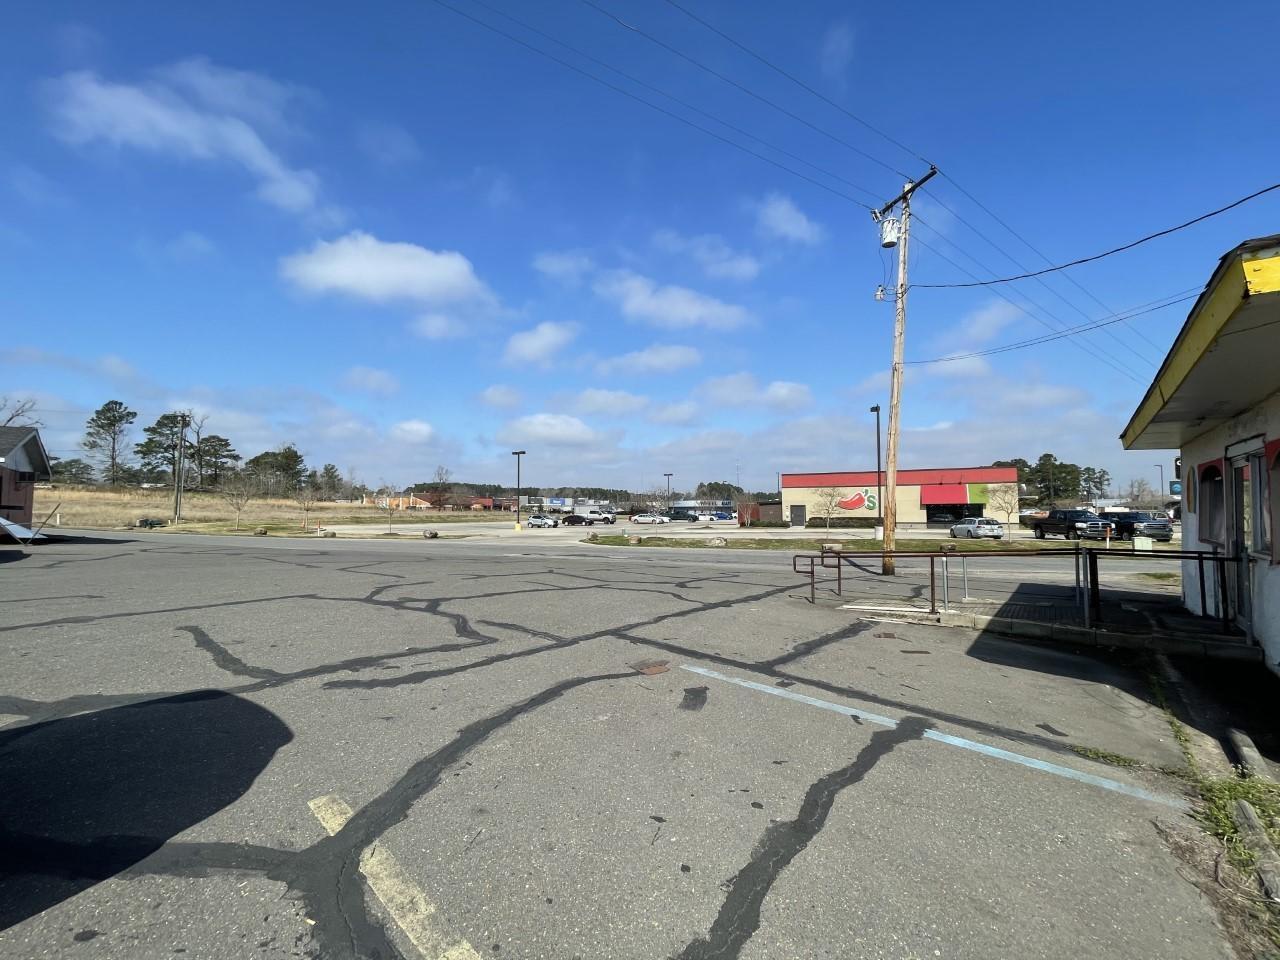 Leesville commercial property for sale, 2700 Colony Blvd, Leesville LA - $1,777,128